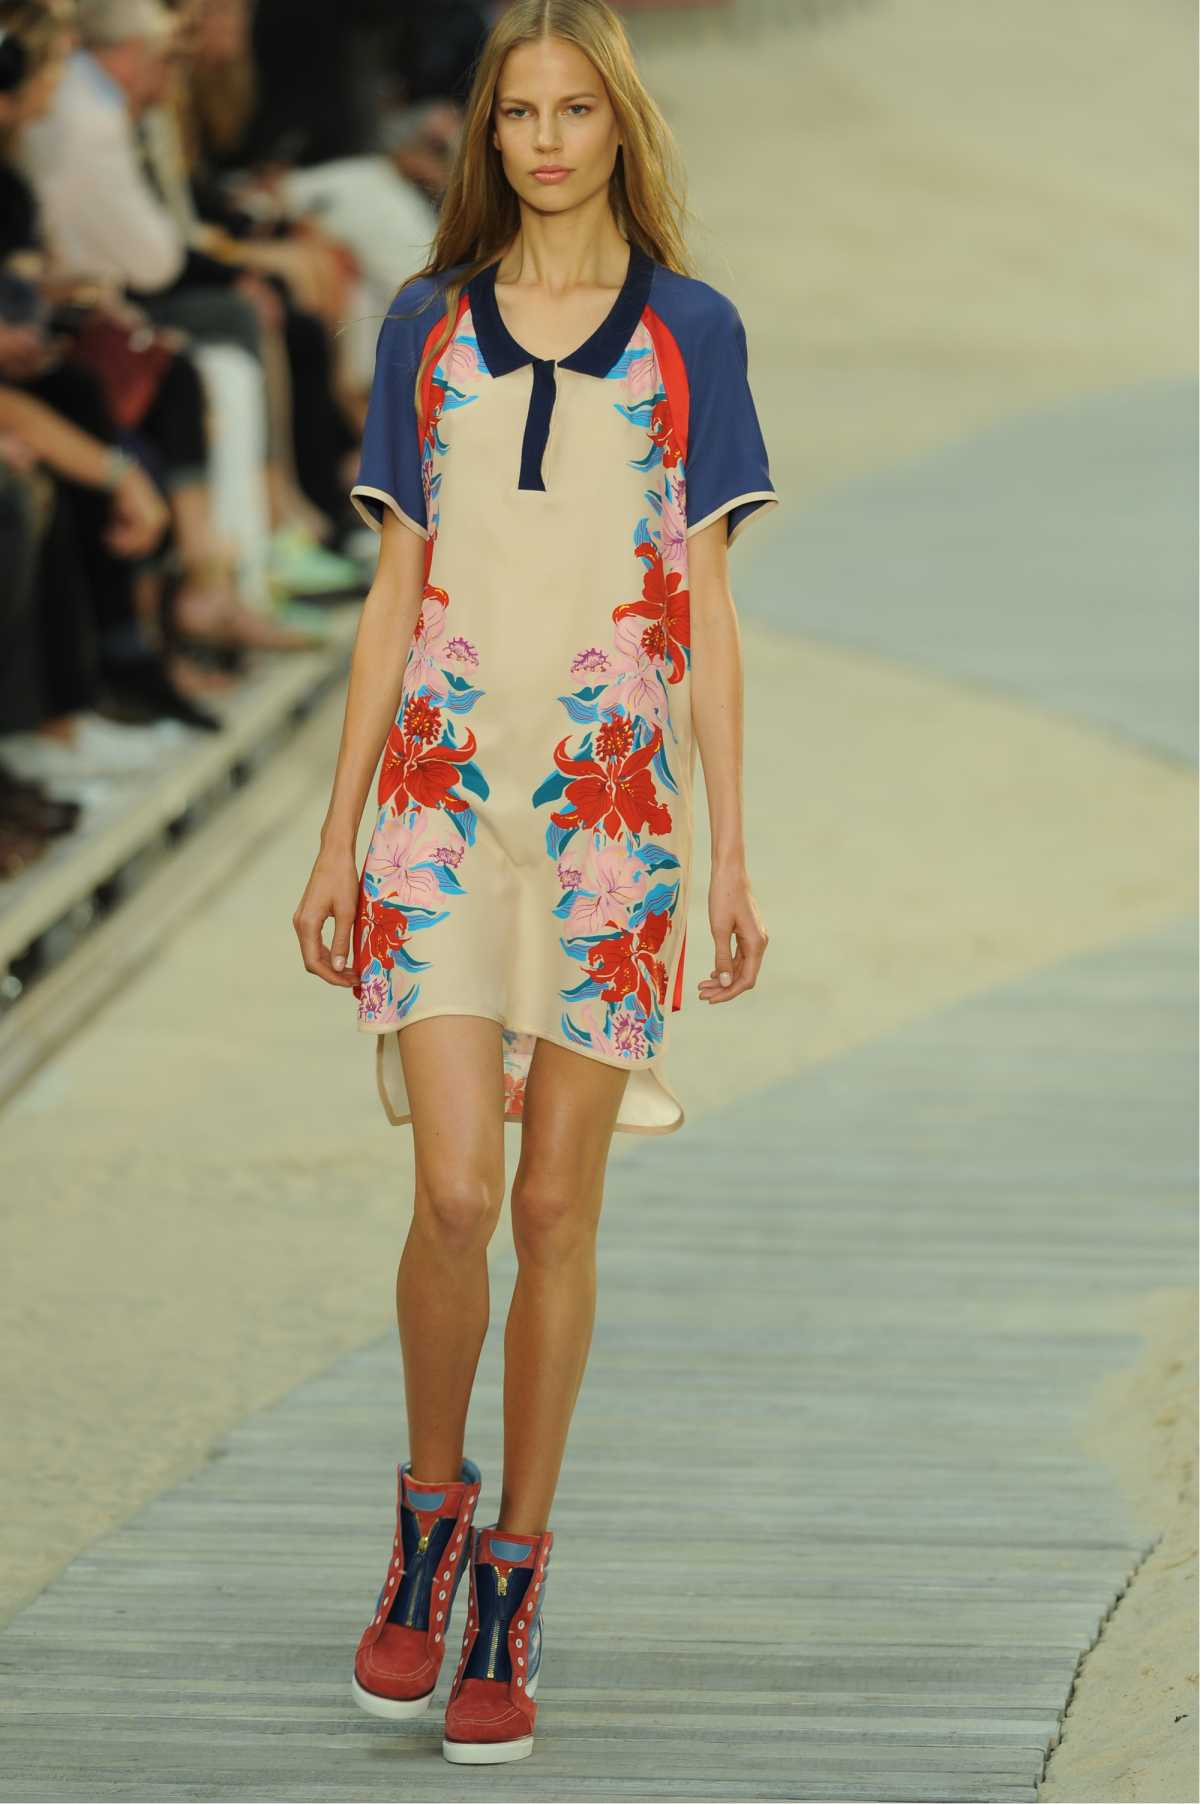 look com vestido floral e bota coturno colorida